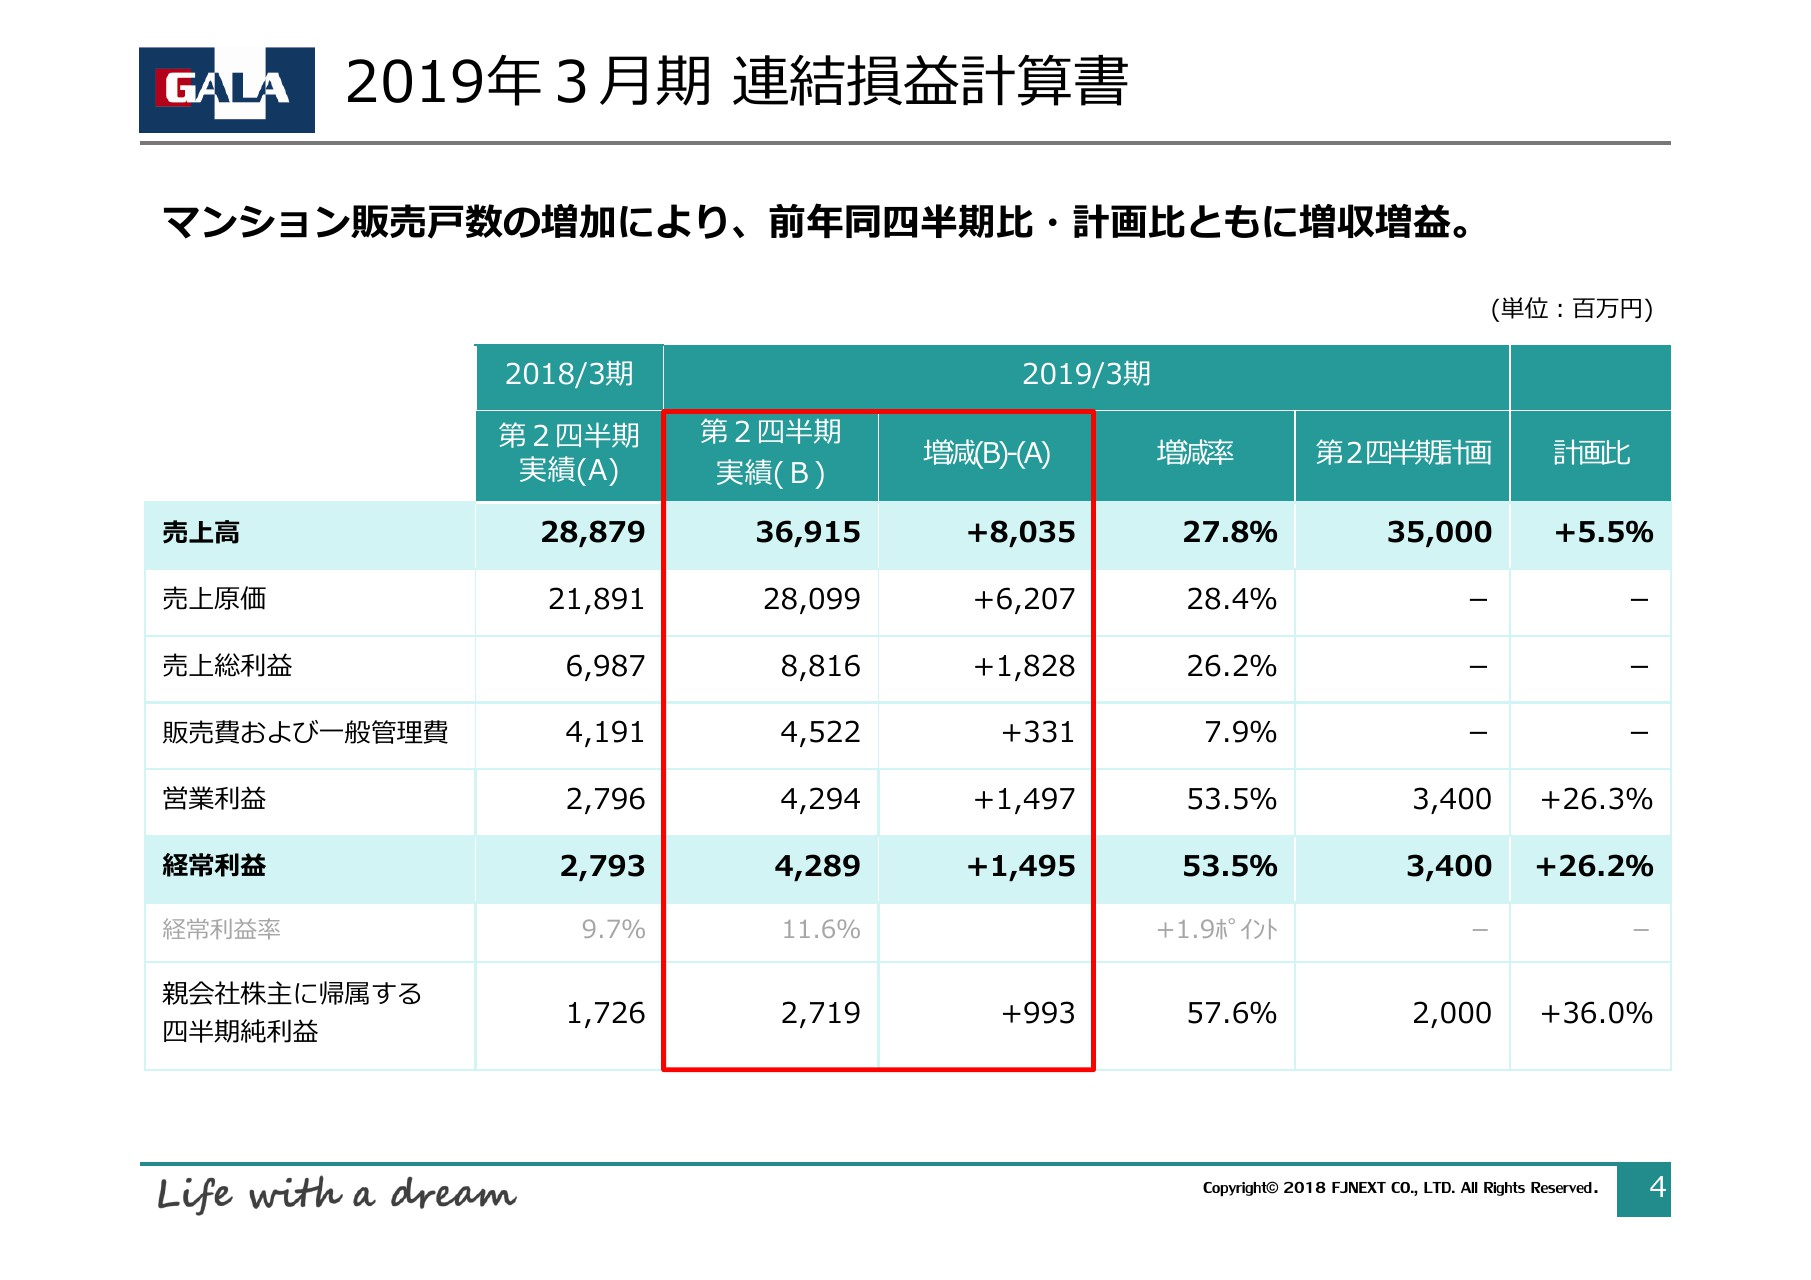 FJネクスト、売上と各利益が過去最高値を記録 通期も過去最高益を予定